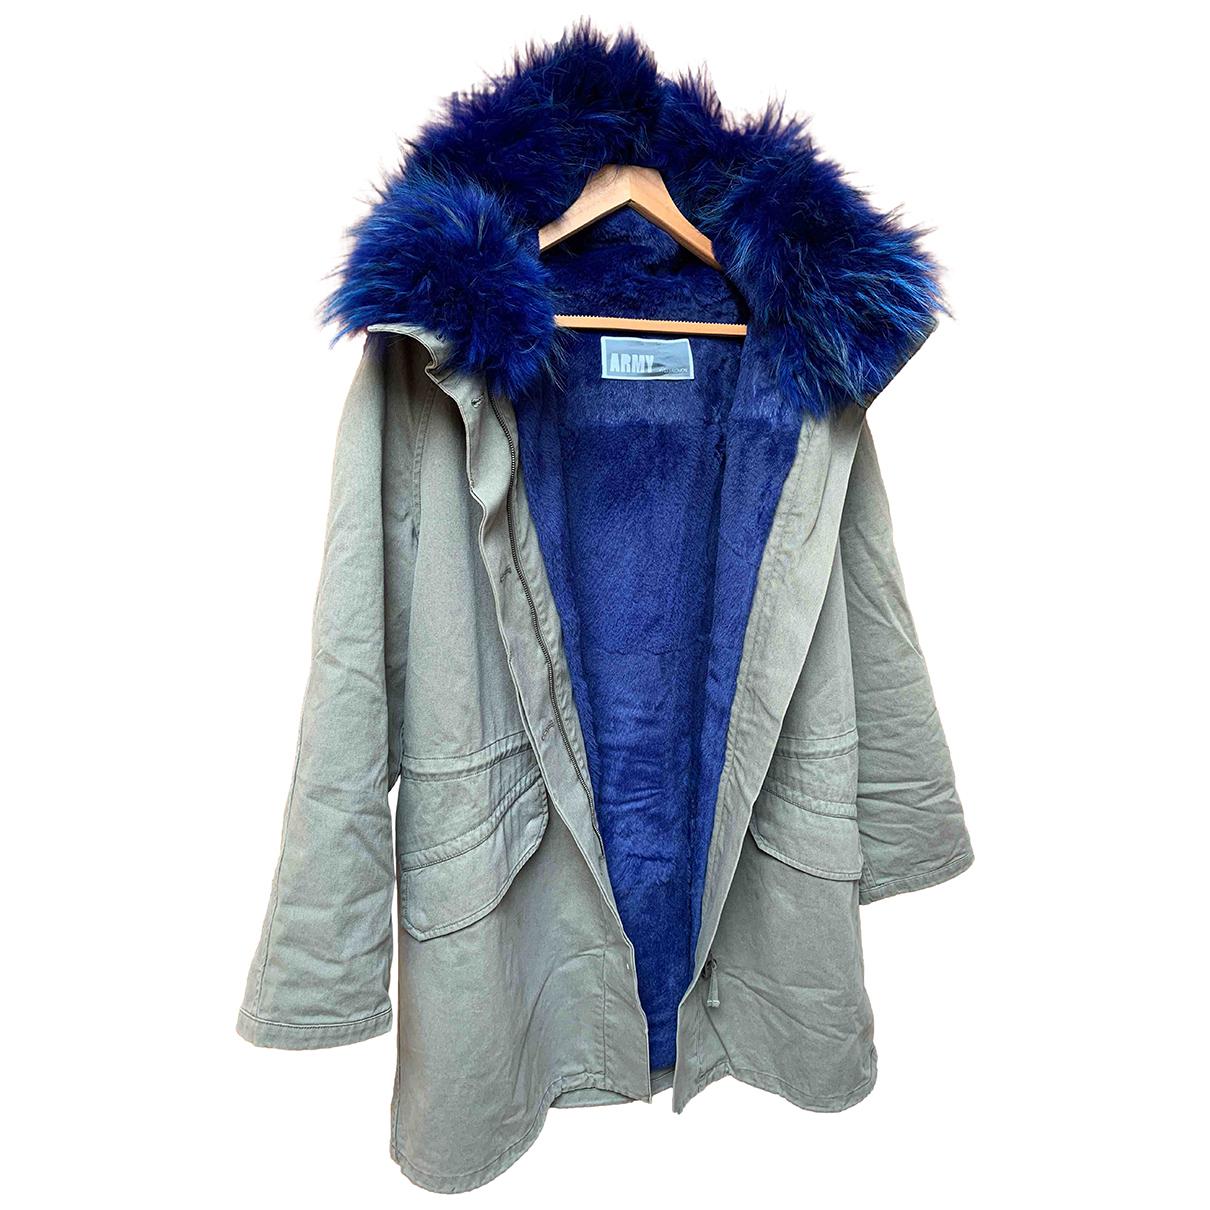 Yves Salomon - Manteau   pour femme en lapin - bleu